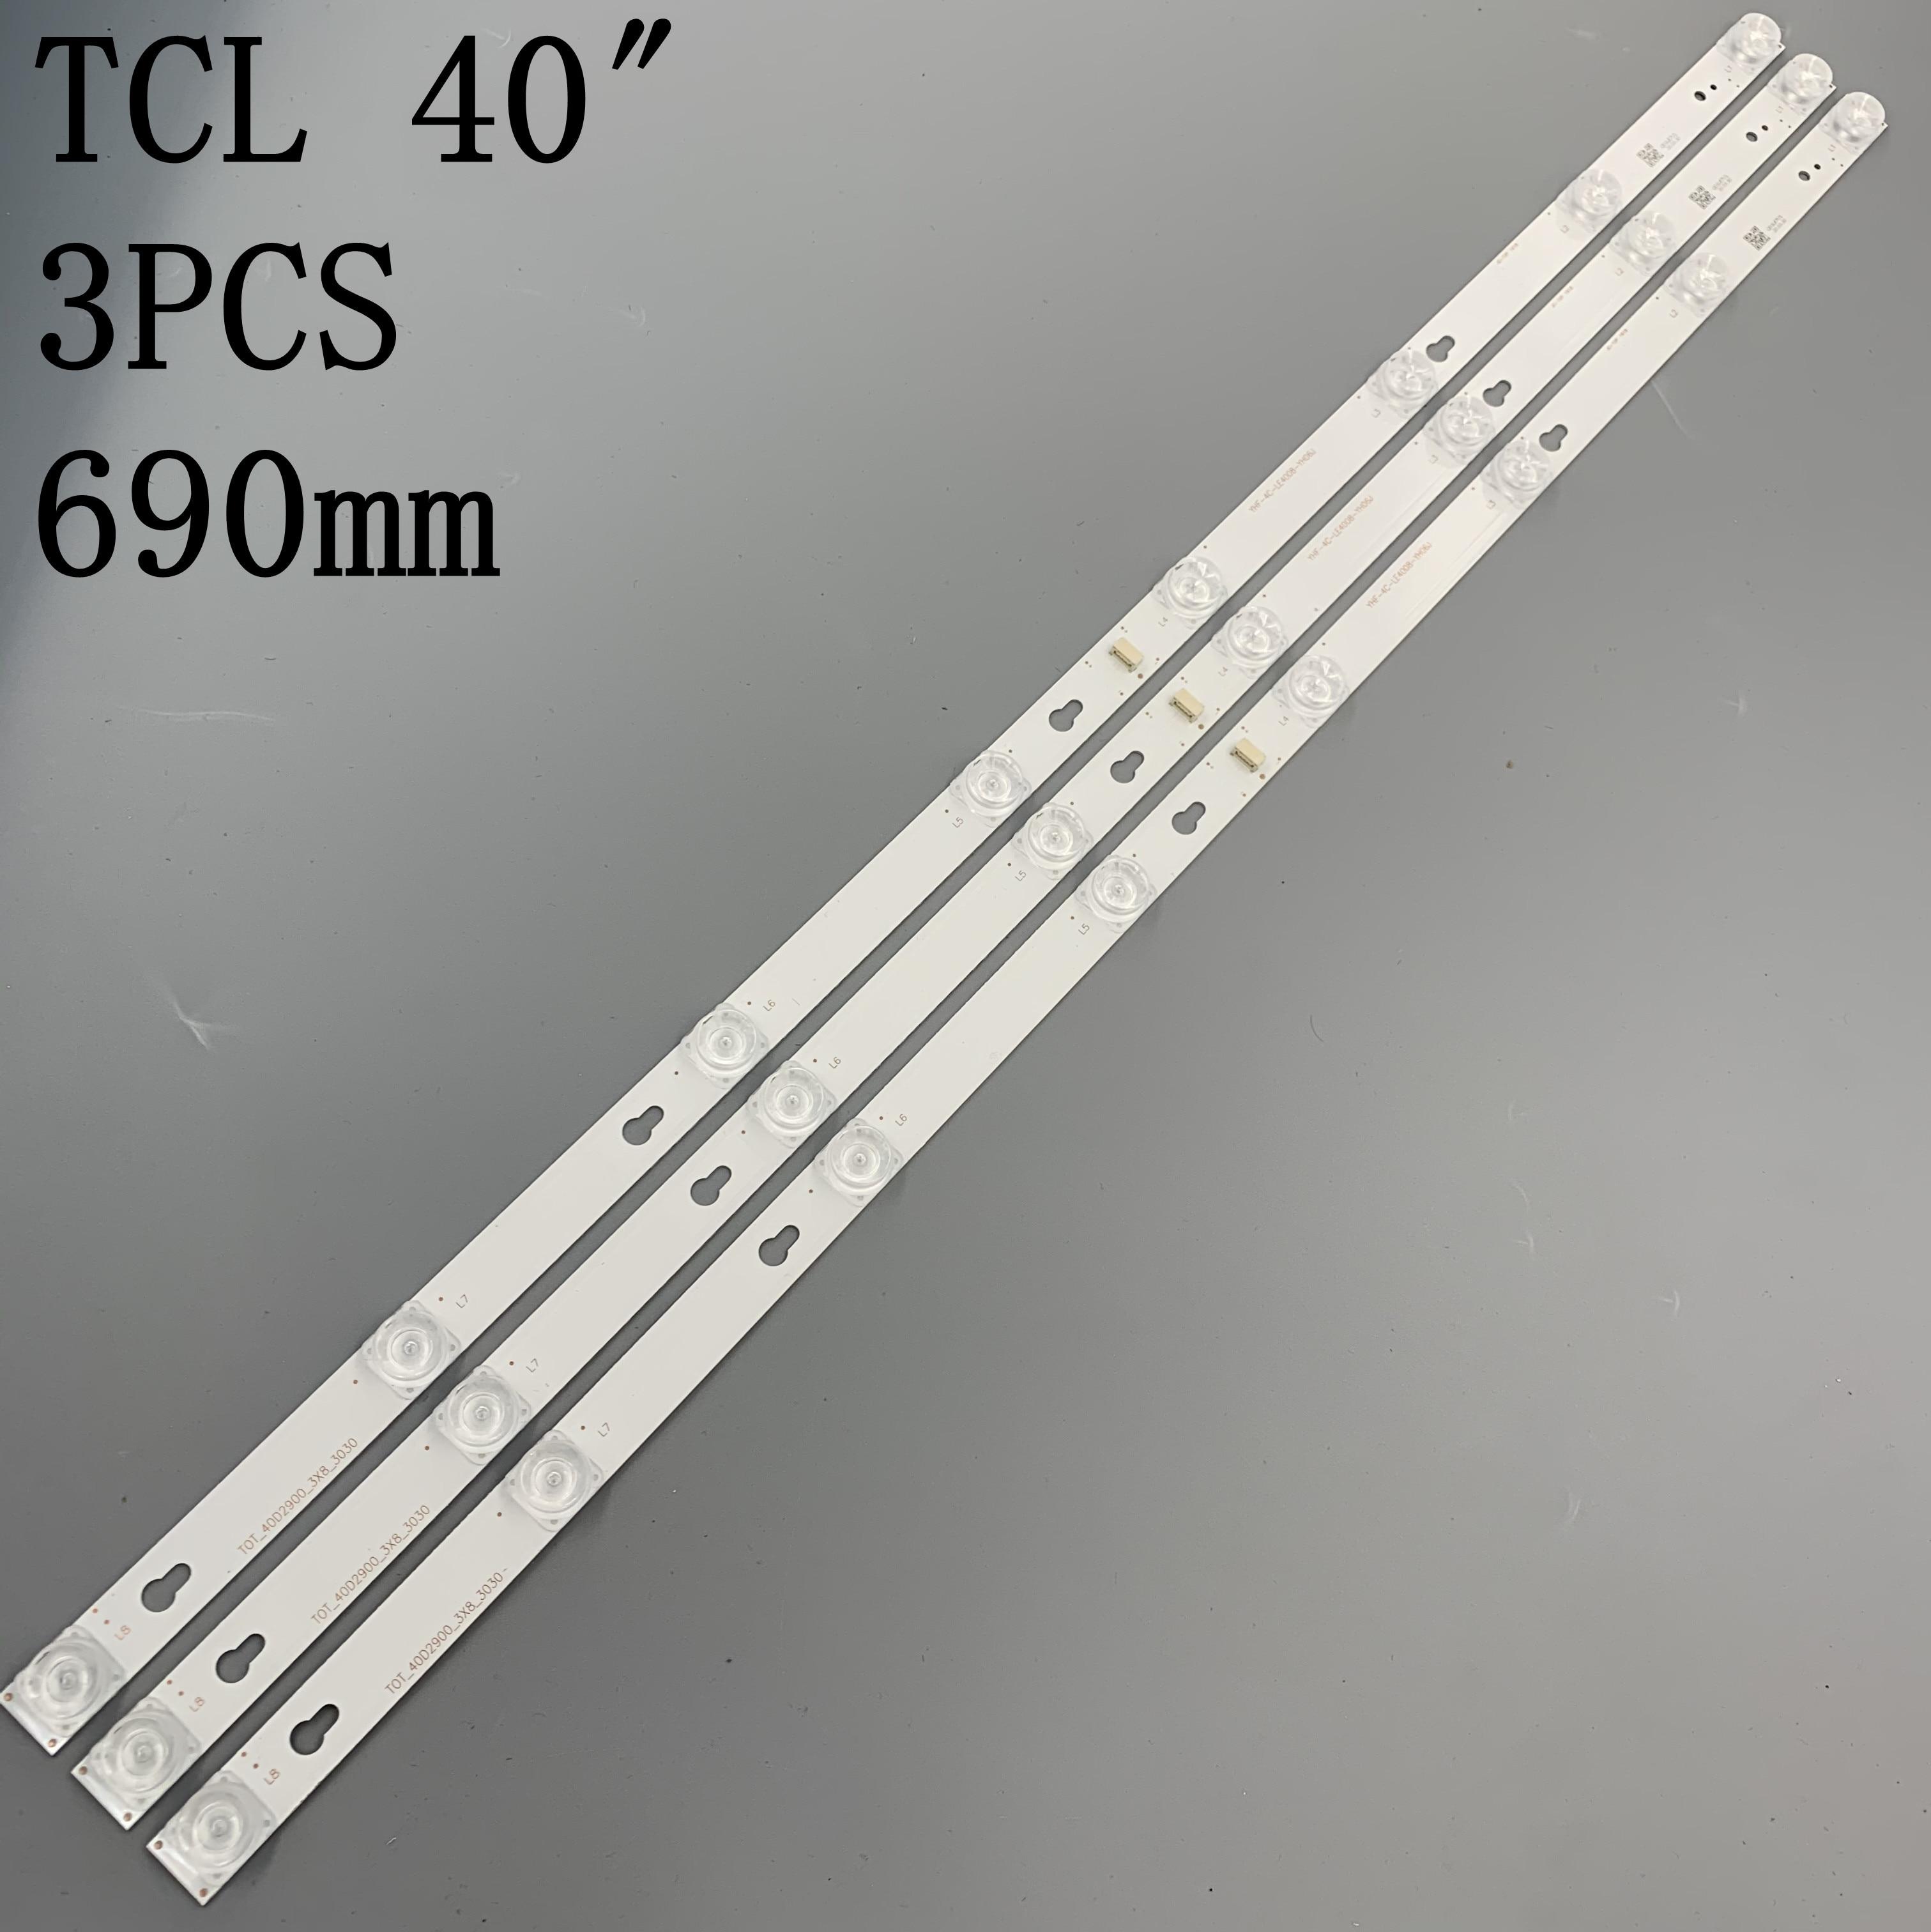 tcl-l40p1a-f-barra-de-luz-tot-40d2900-3x8-3030c-yha-4c-lb4008-yh07j-longitud-total-69cm-3-barras-de-luz